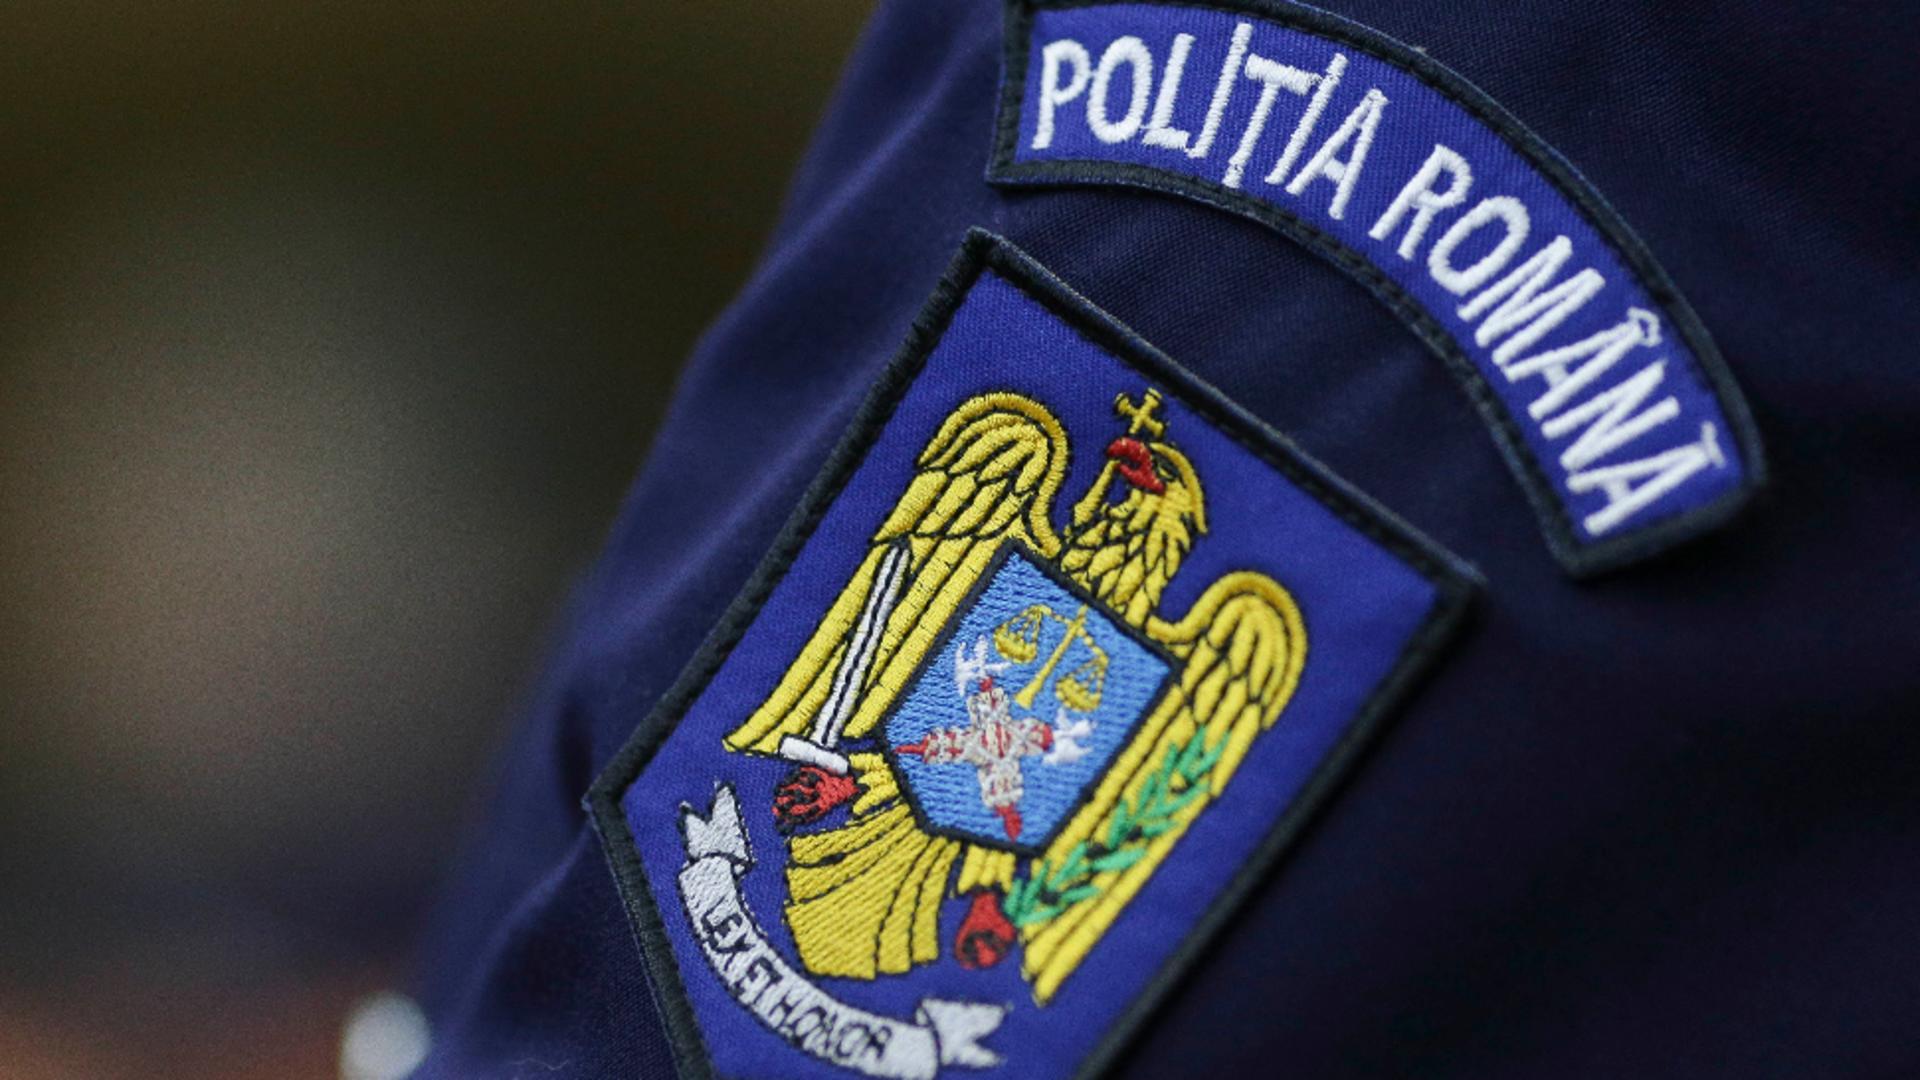 Polițist din Sibiu, anchetat pentru tortură, șantaj și furt / Foto: Inquam Photos